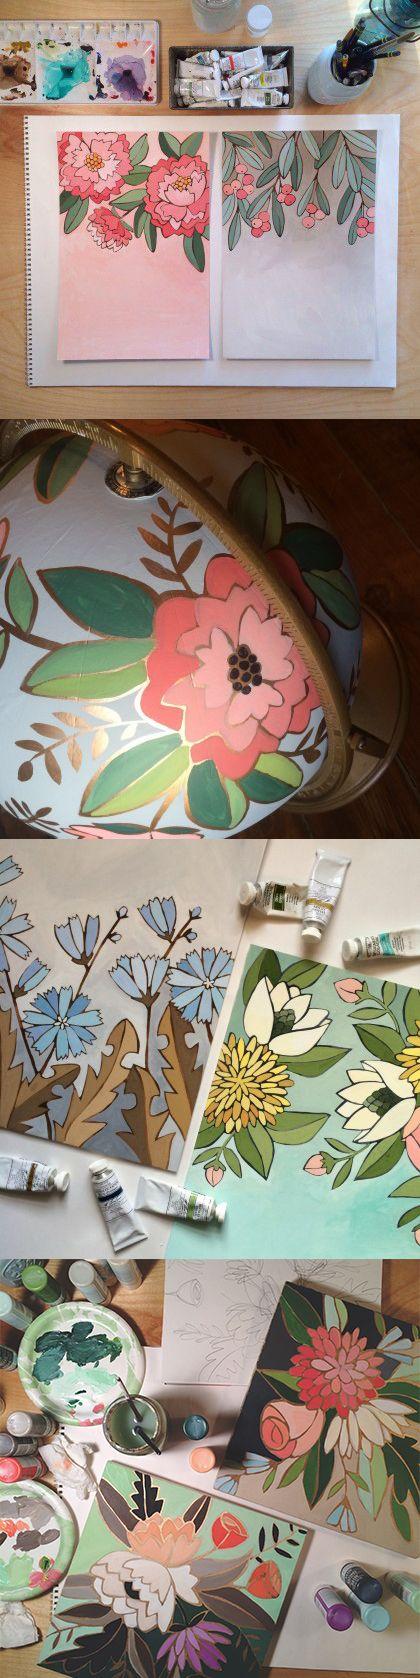 Florals | 1canoe2 Blog More